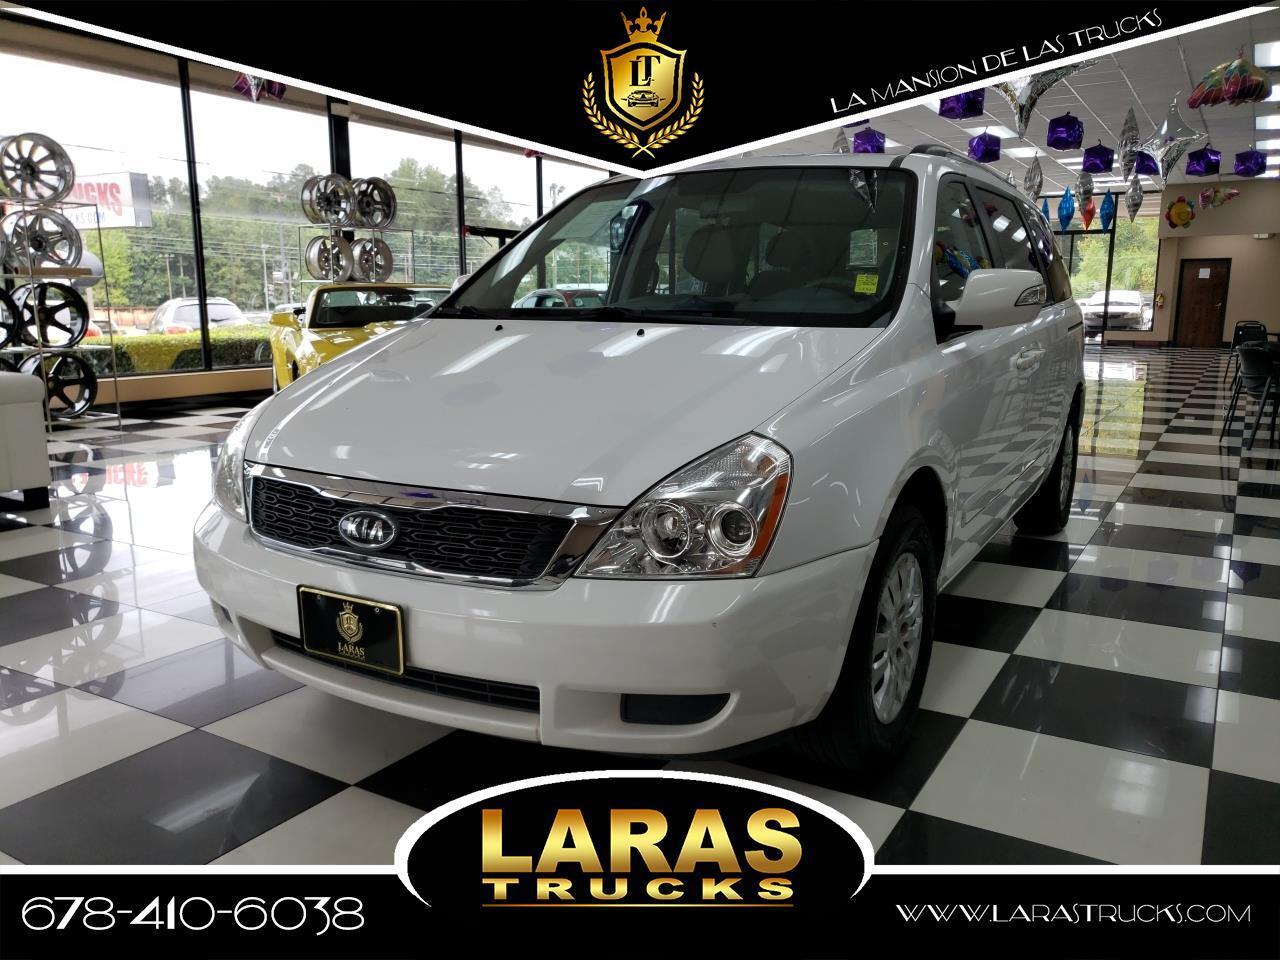 2011 Kia Sedona 4dr LWB LX